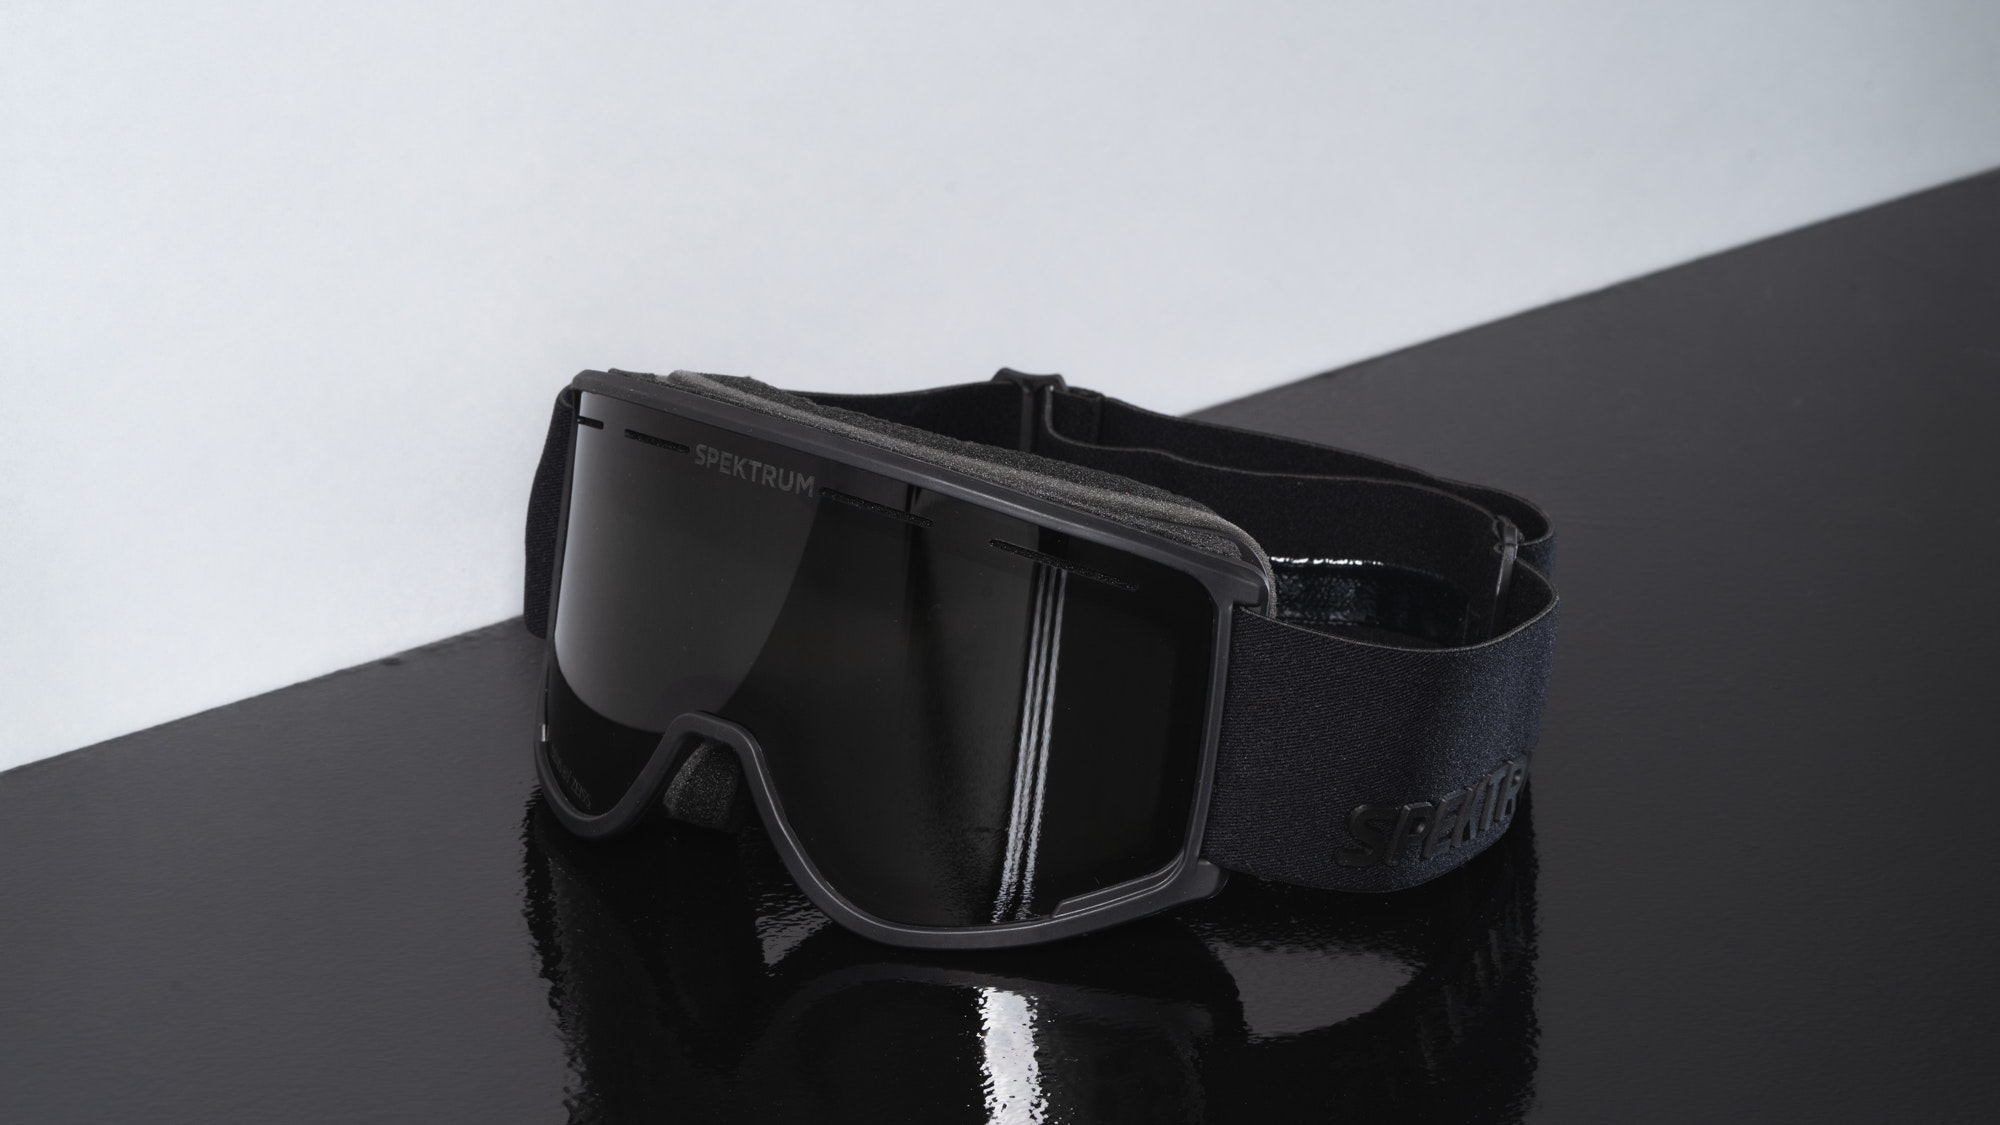 Spektrum Templet Essential Goggles | Review